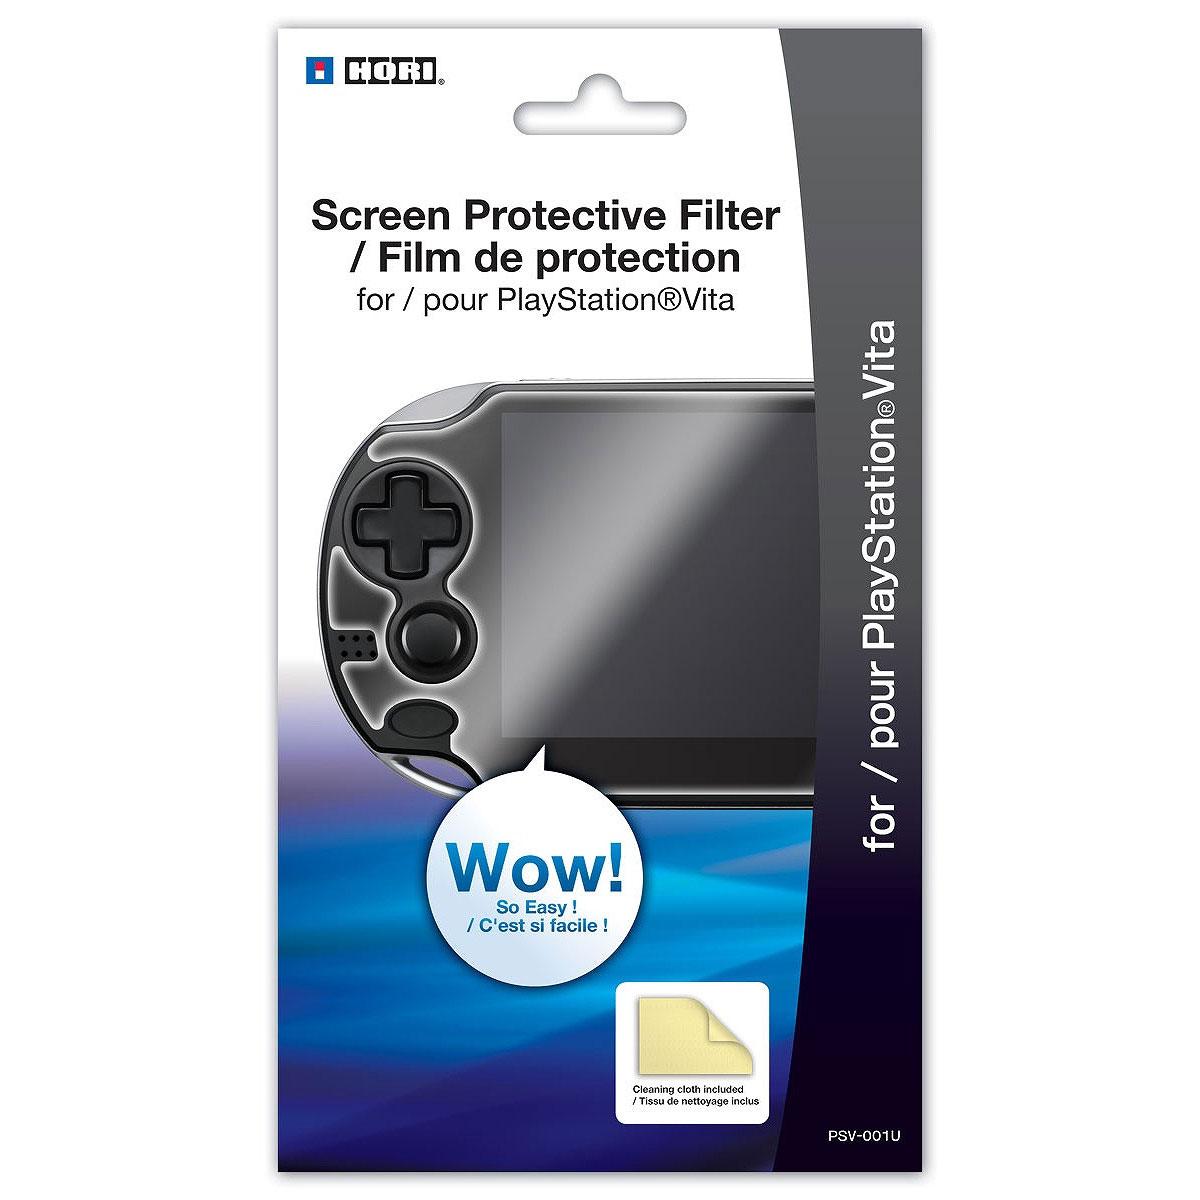 Accessoires PS Vita Hori Film Protection Ecran (PS Vita) Film protecteur pour PS Vita